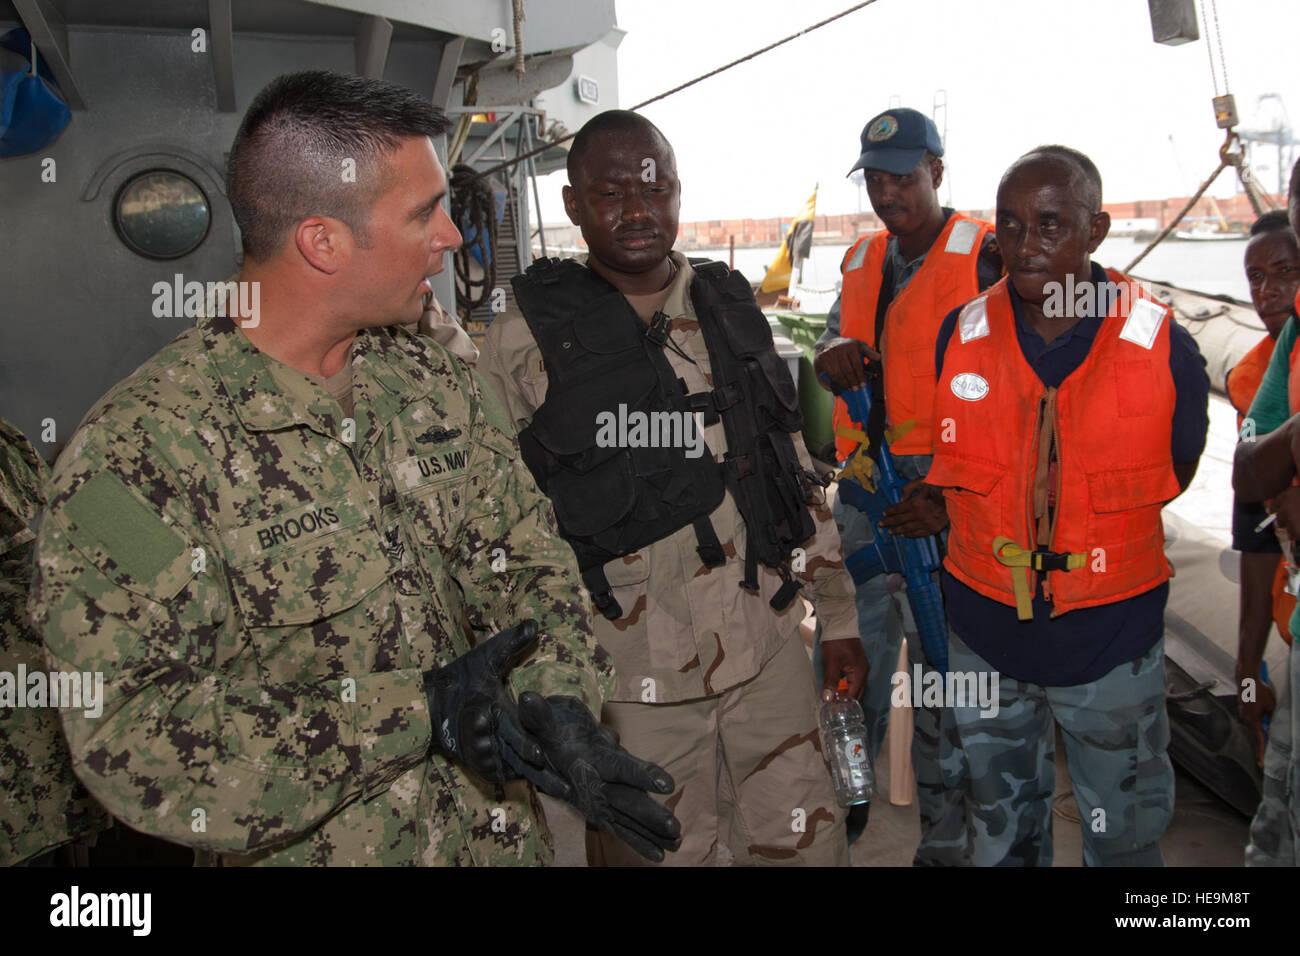 PORT OF DJIBOUTI, Djibouti (May 28, 2012) – U.S. Navy Petty Officer 1st Class John Brooks (left), Maritime Civil Stock Photo